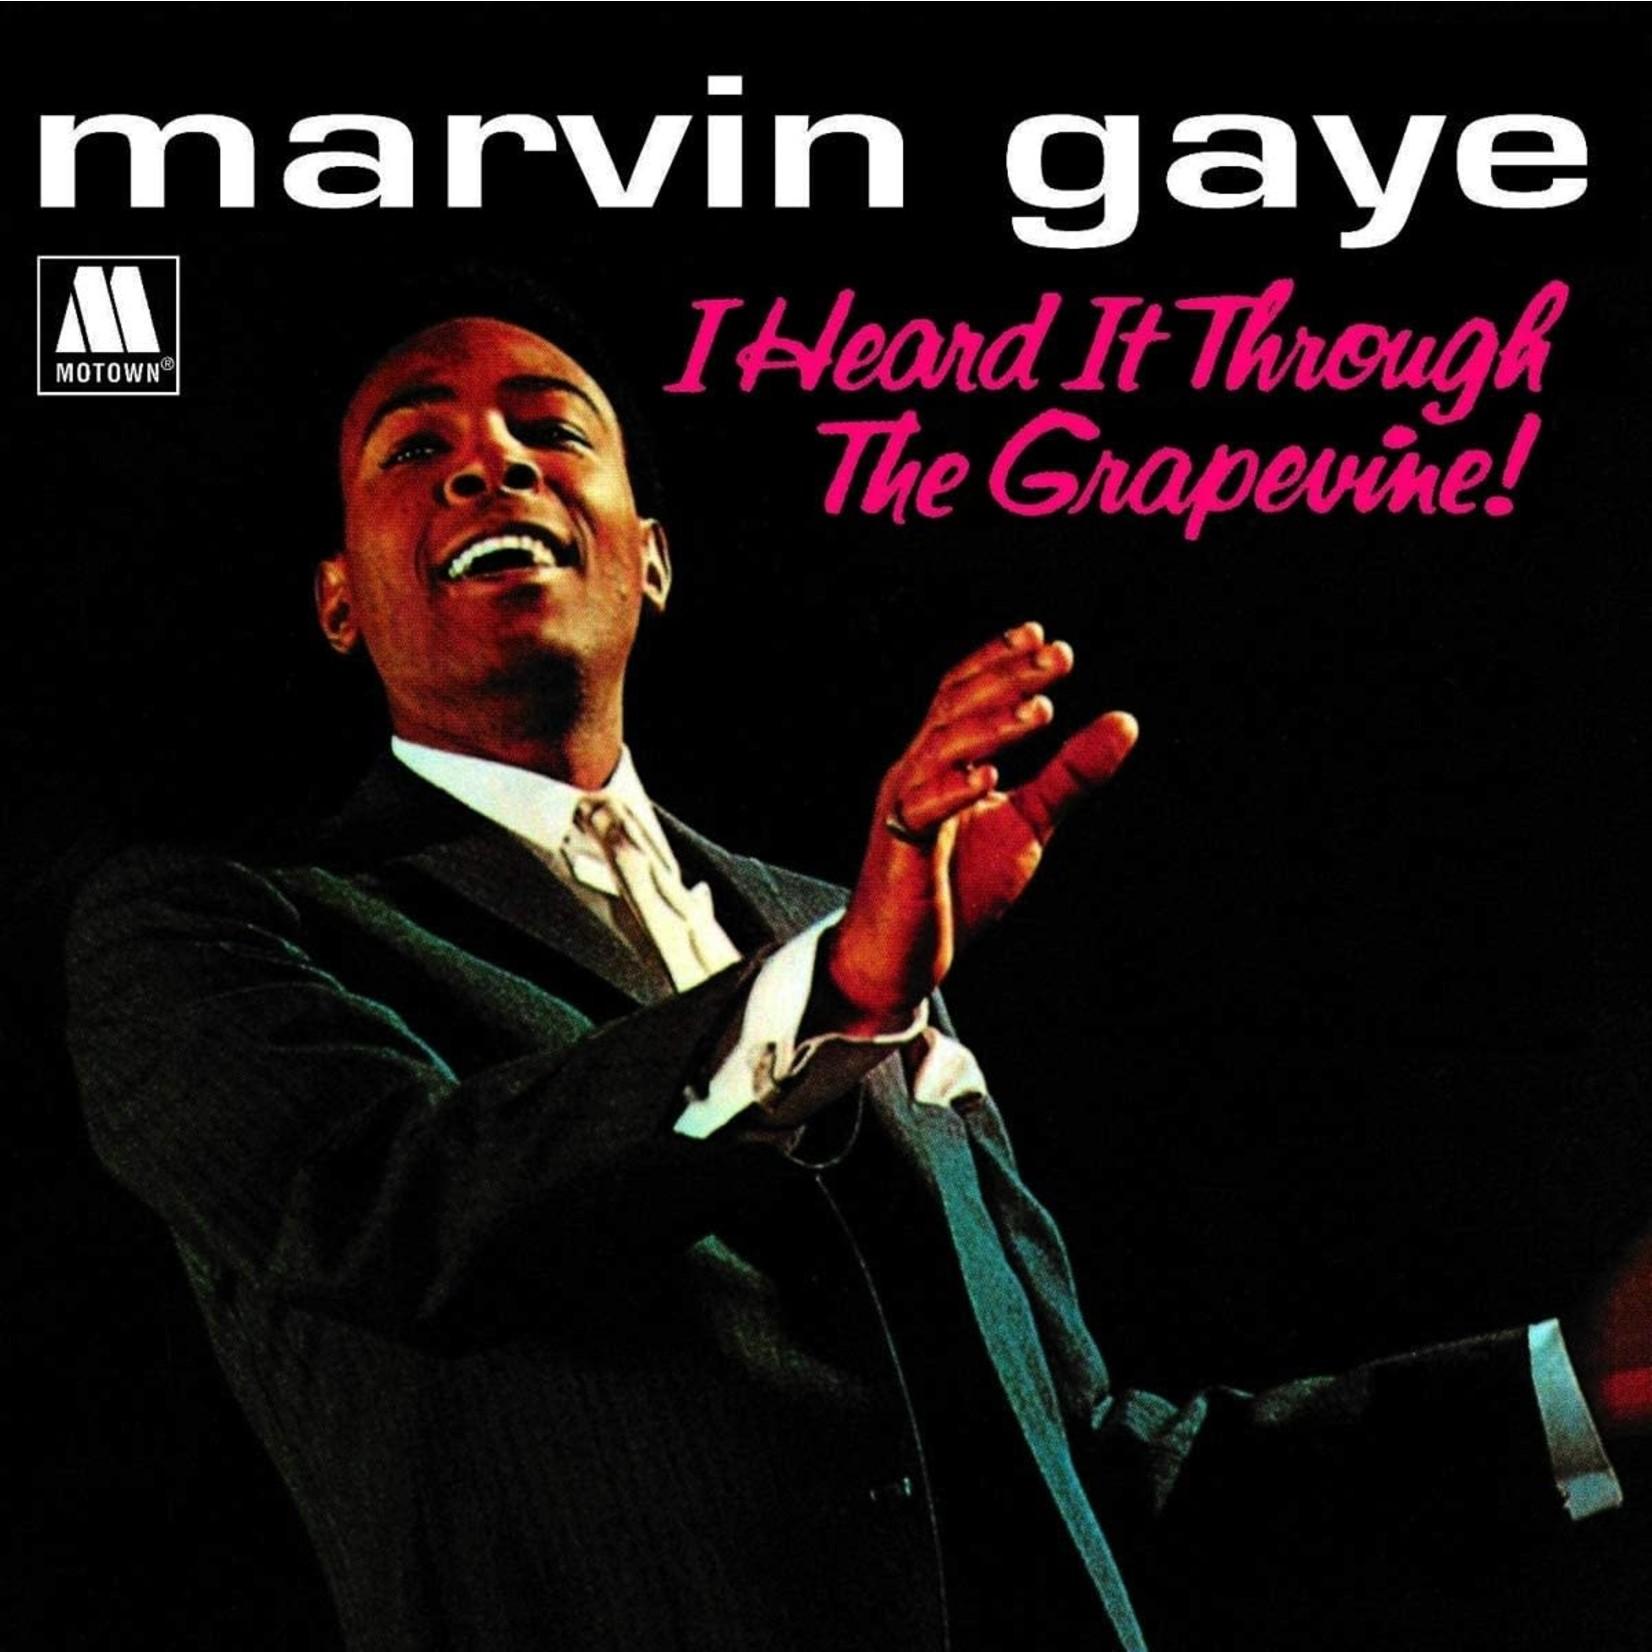 MARVIN GAYE I HEARD IT THROUGH THE GRAPE VINE (LP)